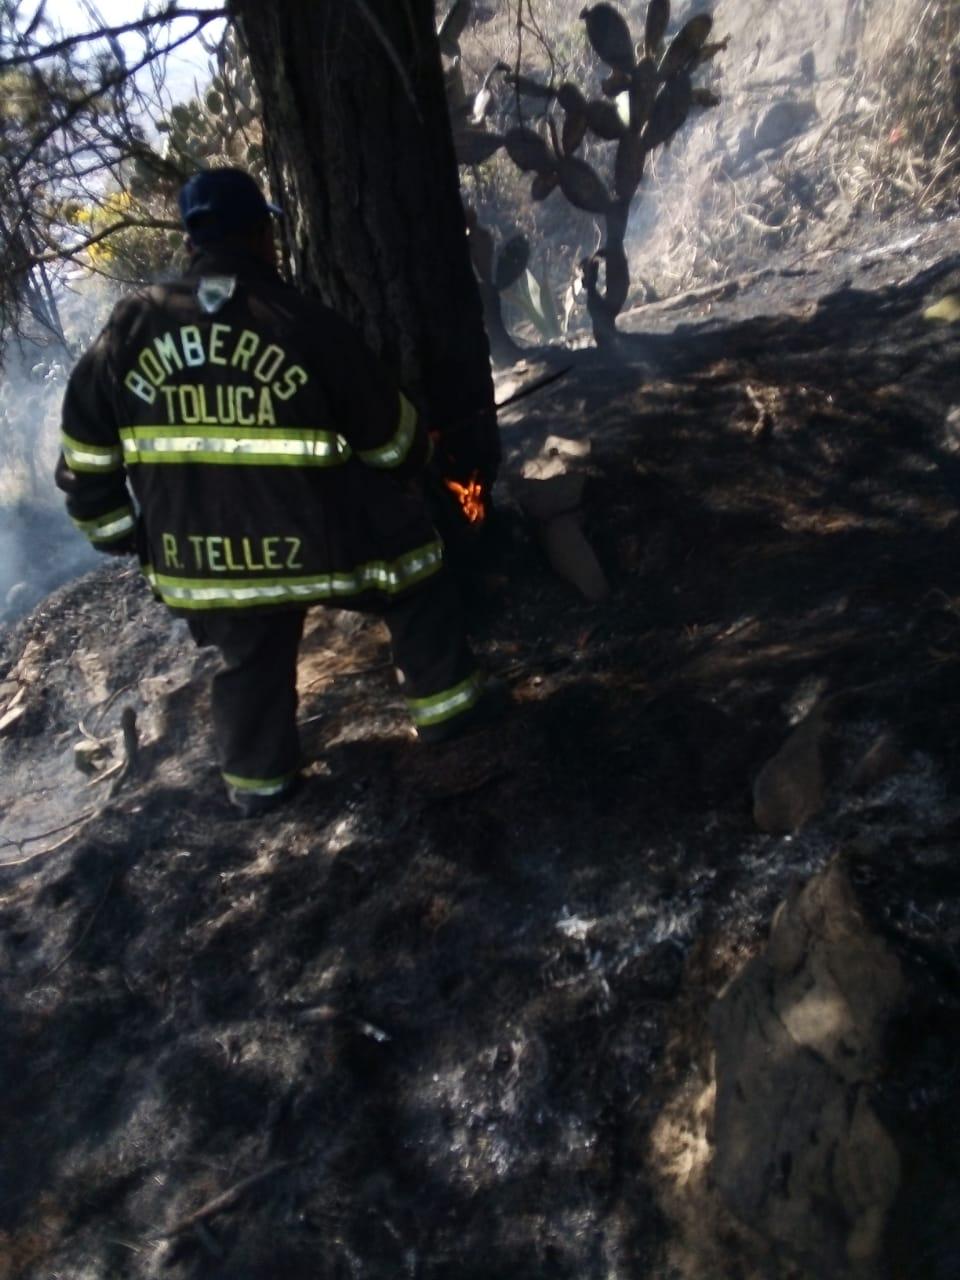 Sofocan Bomberos Toluca 34 incendios de pastizales